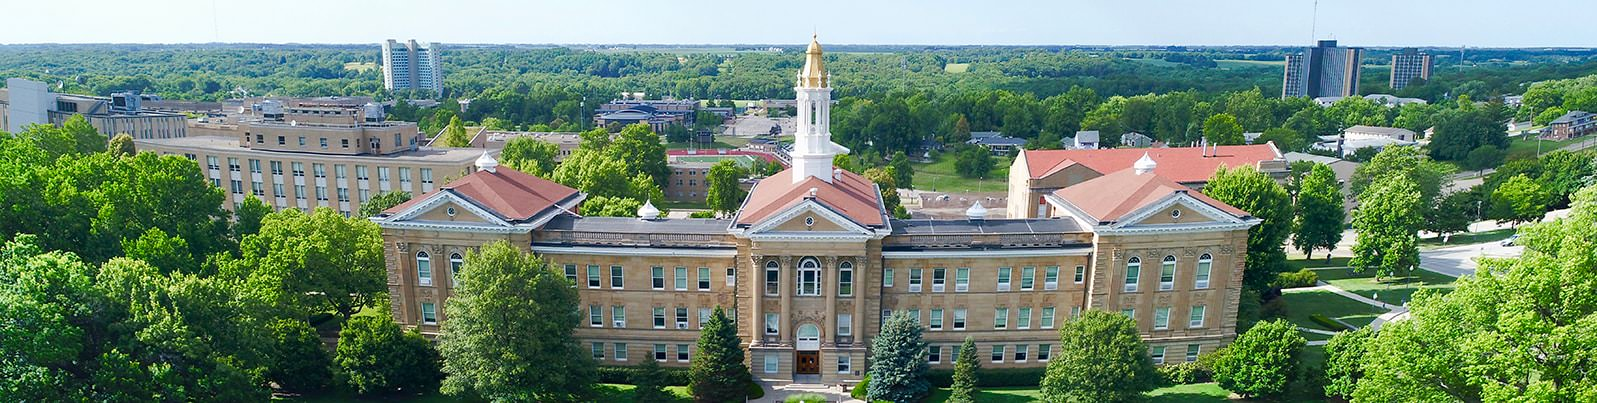 Orientation and Registration - Western Illinois University